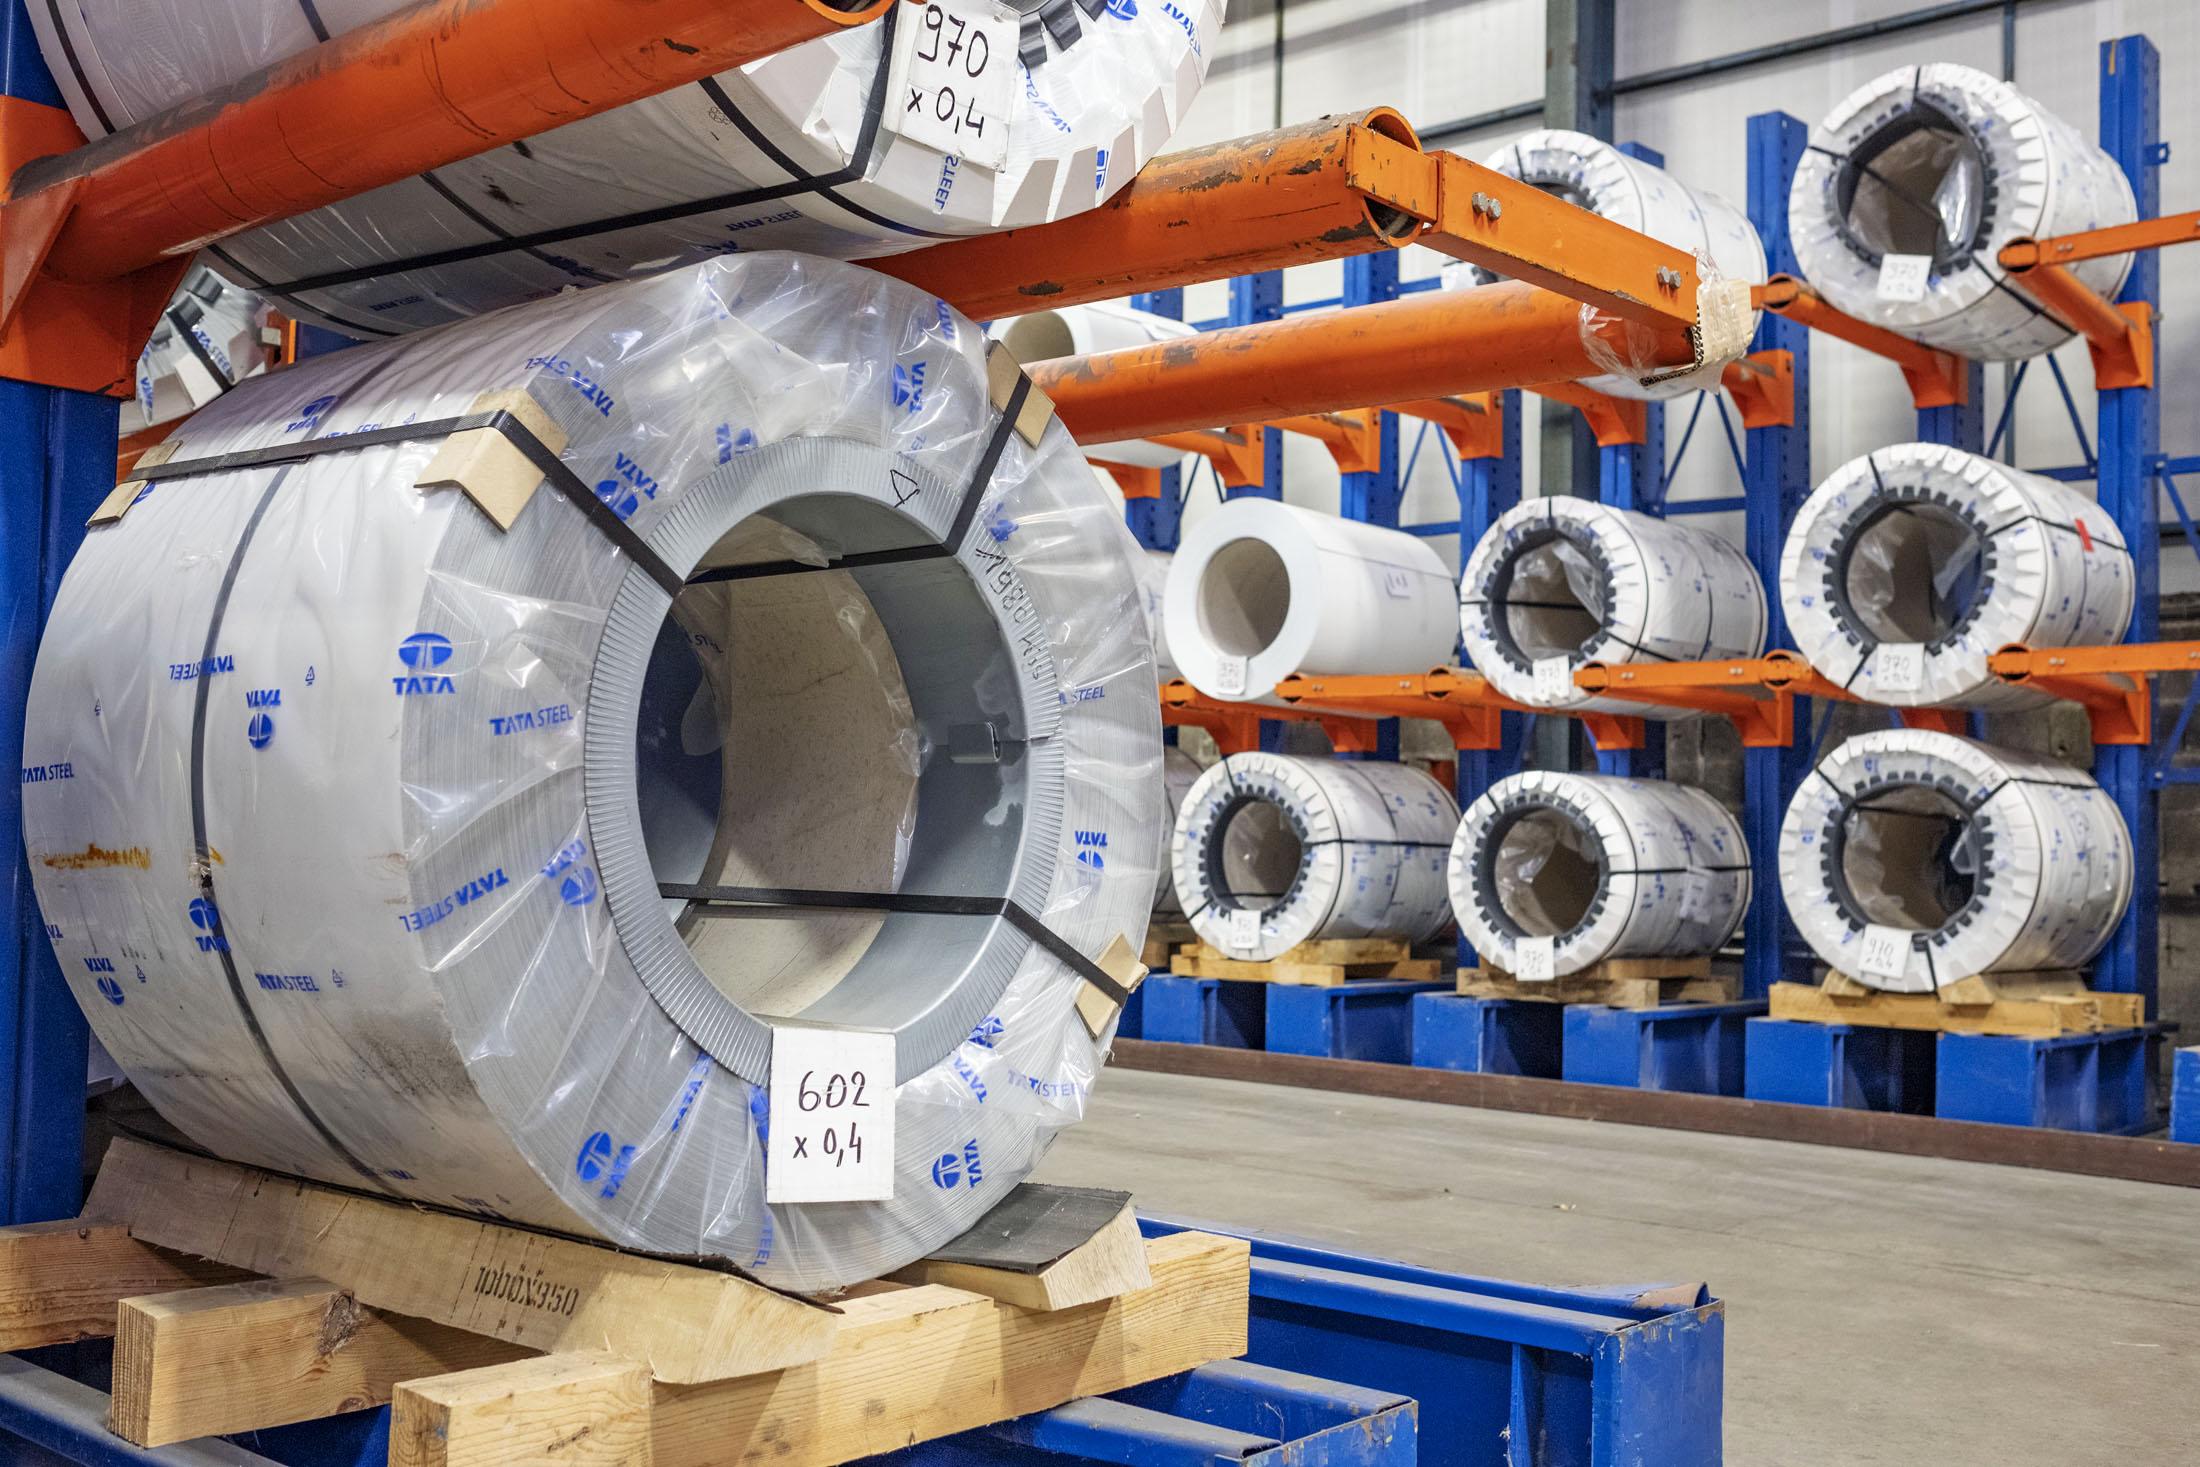 Reportage, photo de stockage de bobines de métal